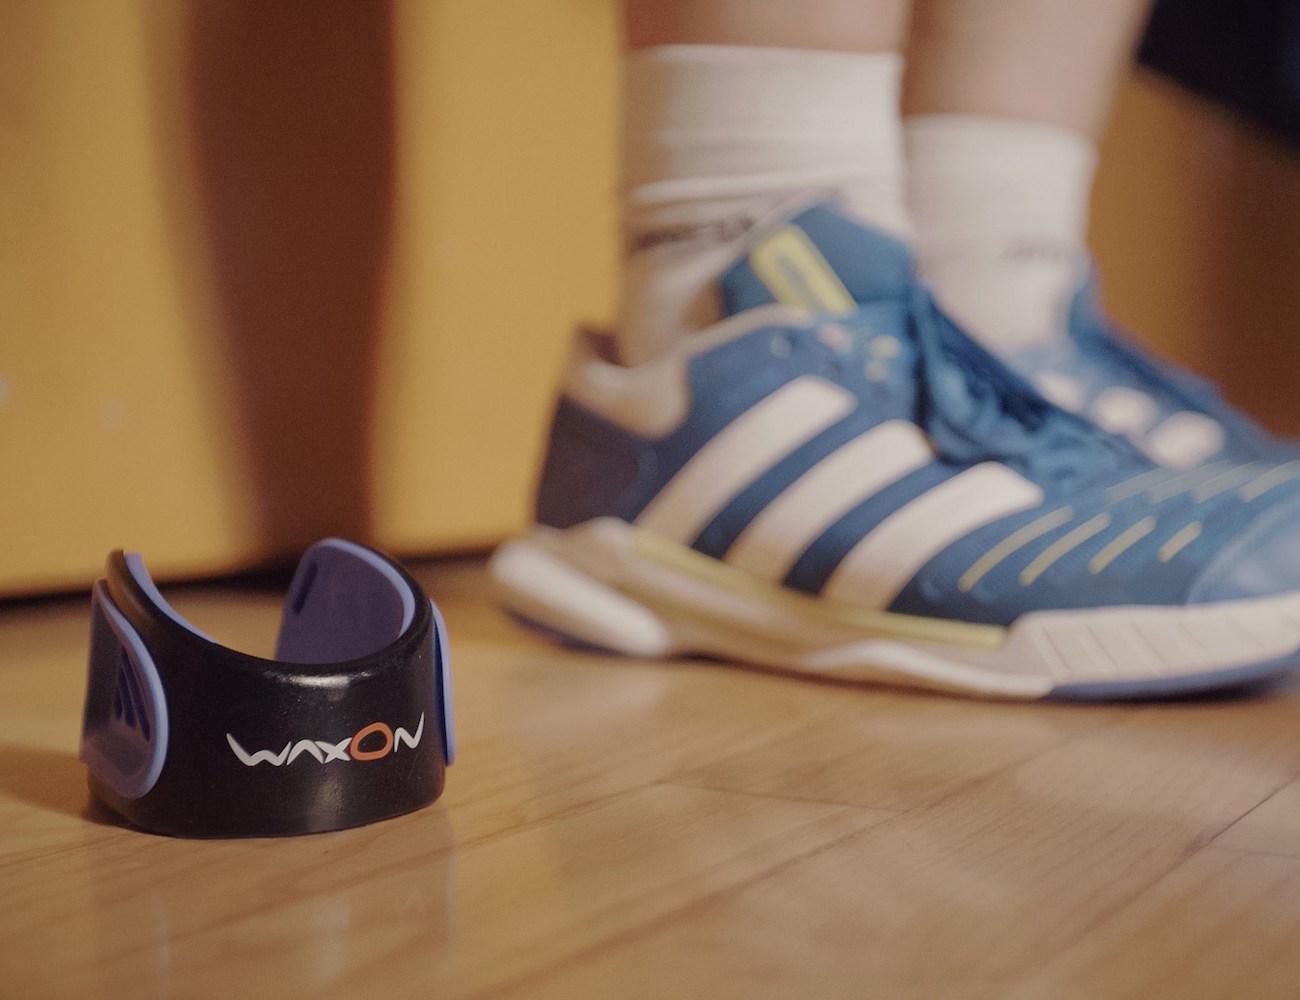 WaxOn – Easily Accessible Wax for Handball Players